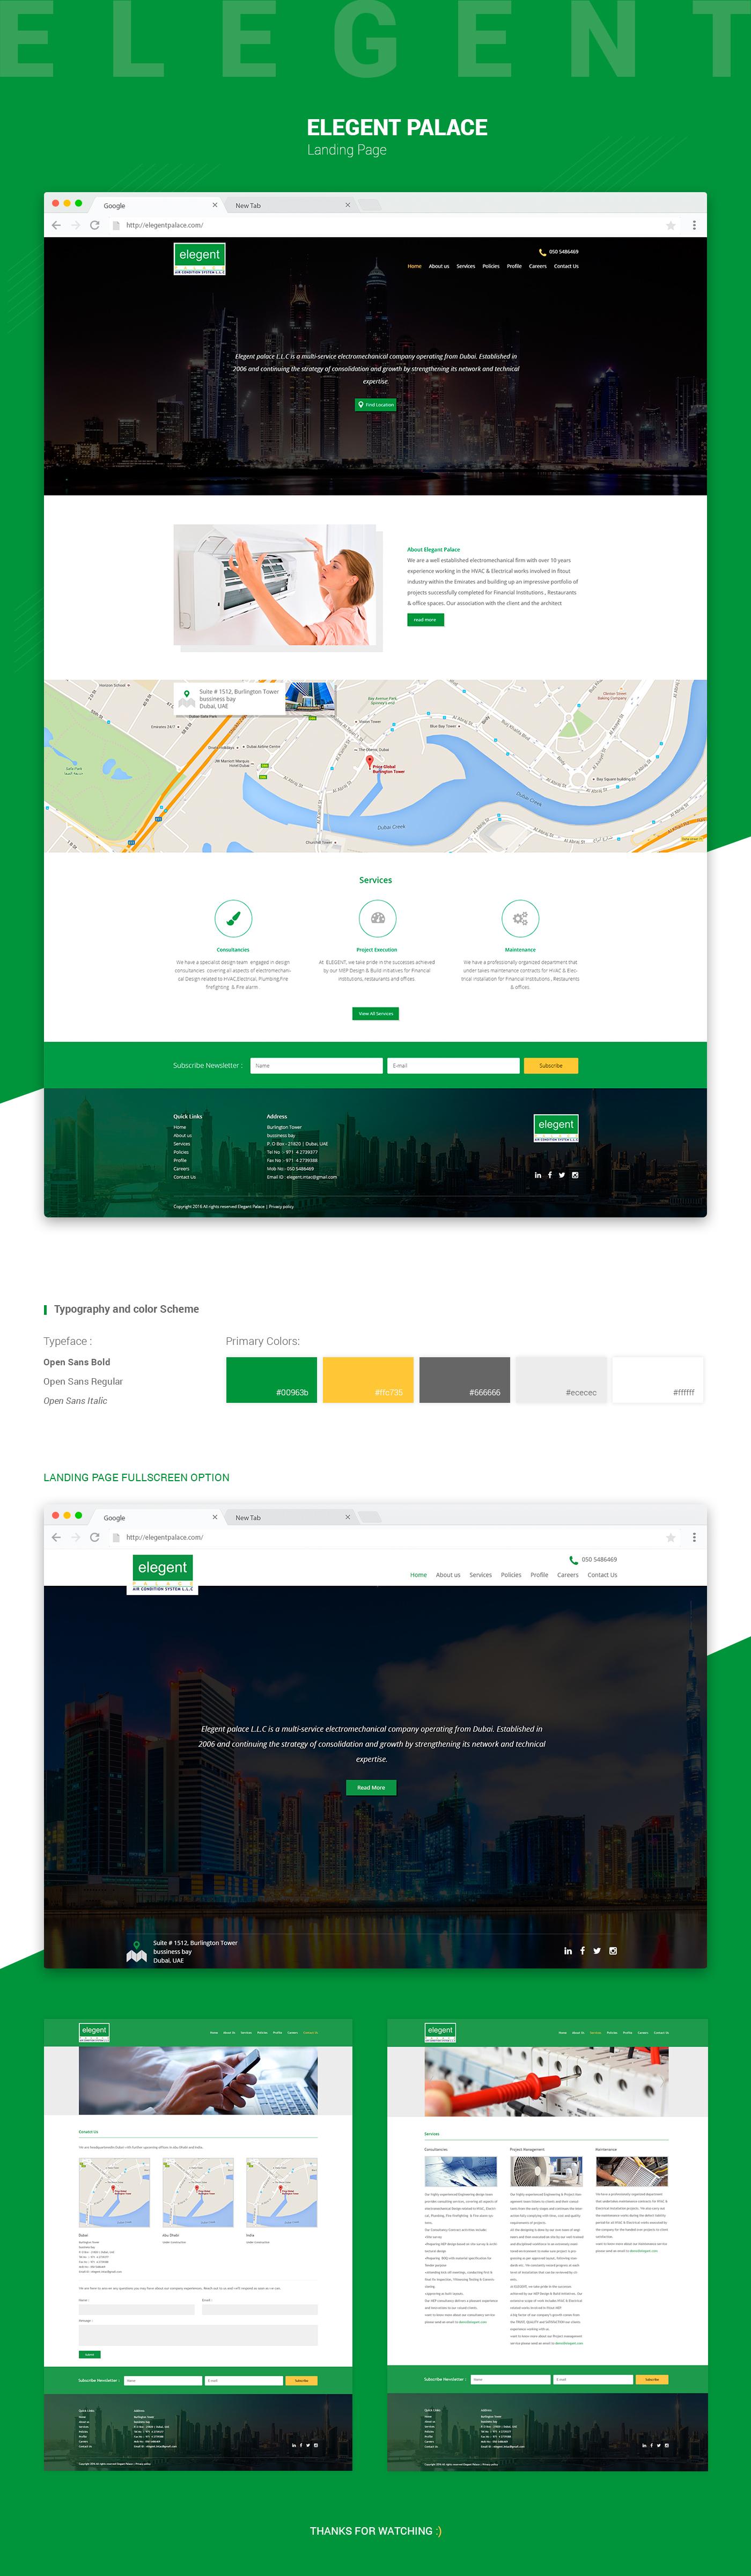 Website Design UI UX design Front end development interface design